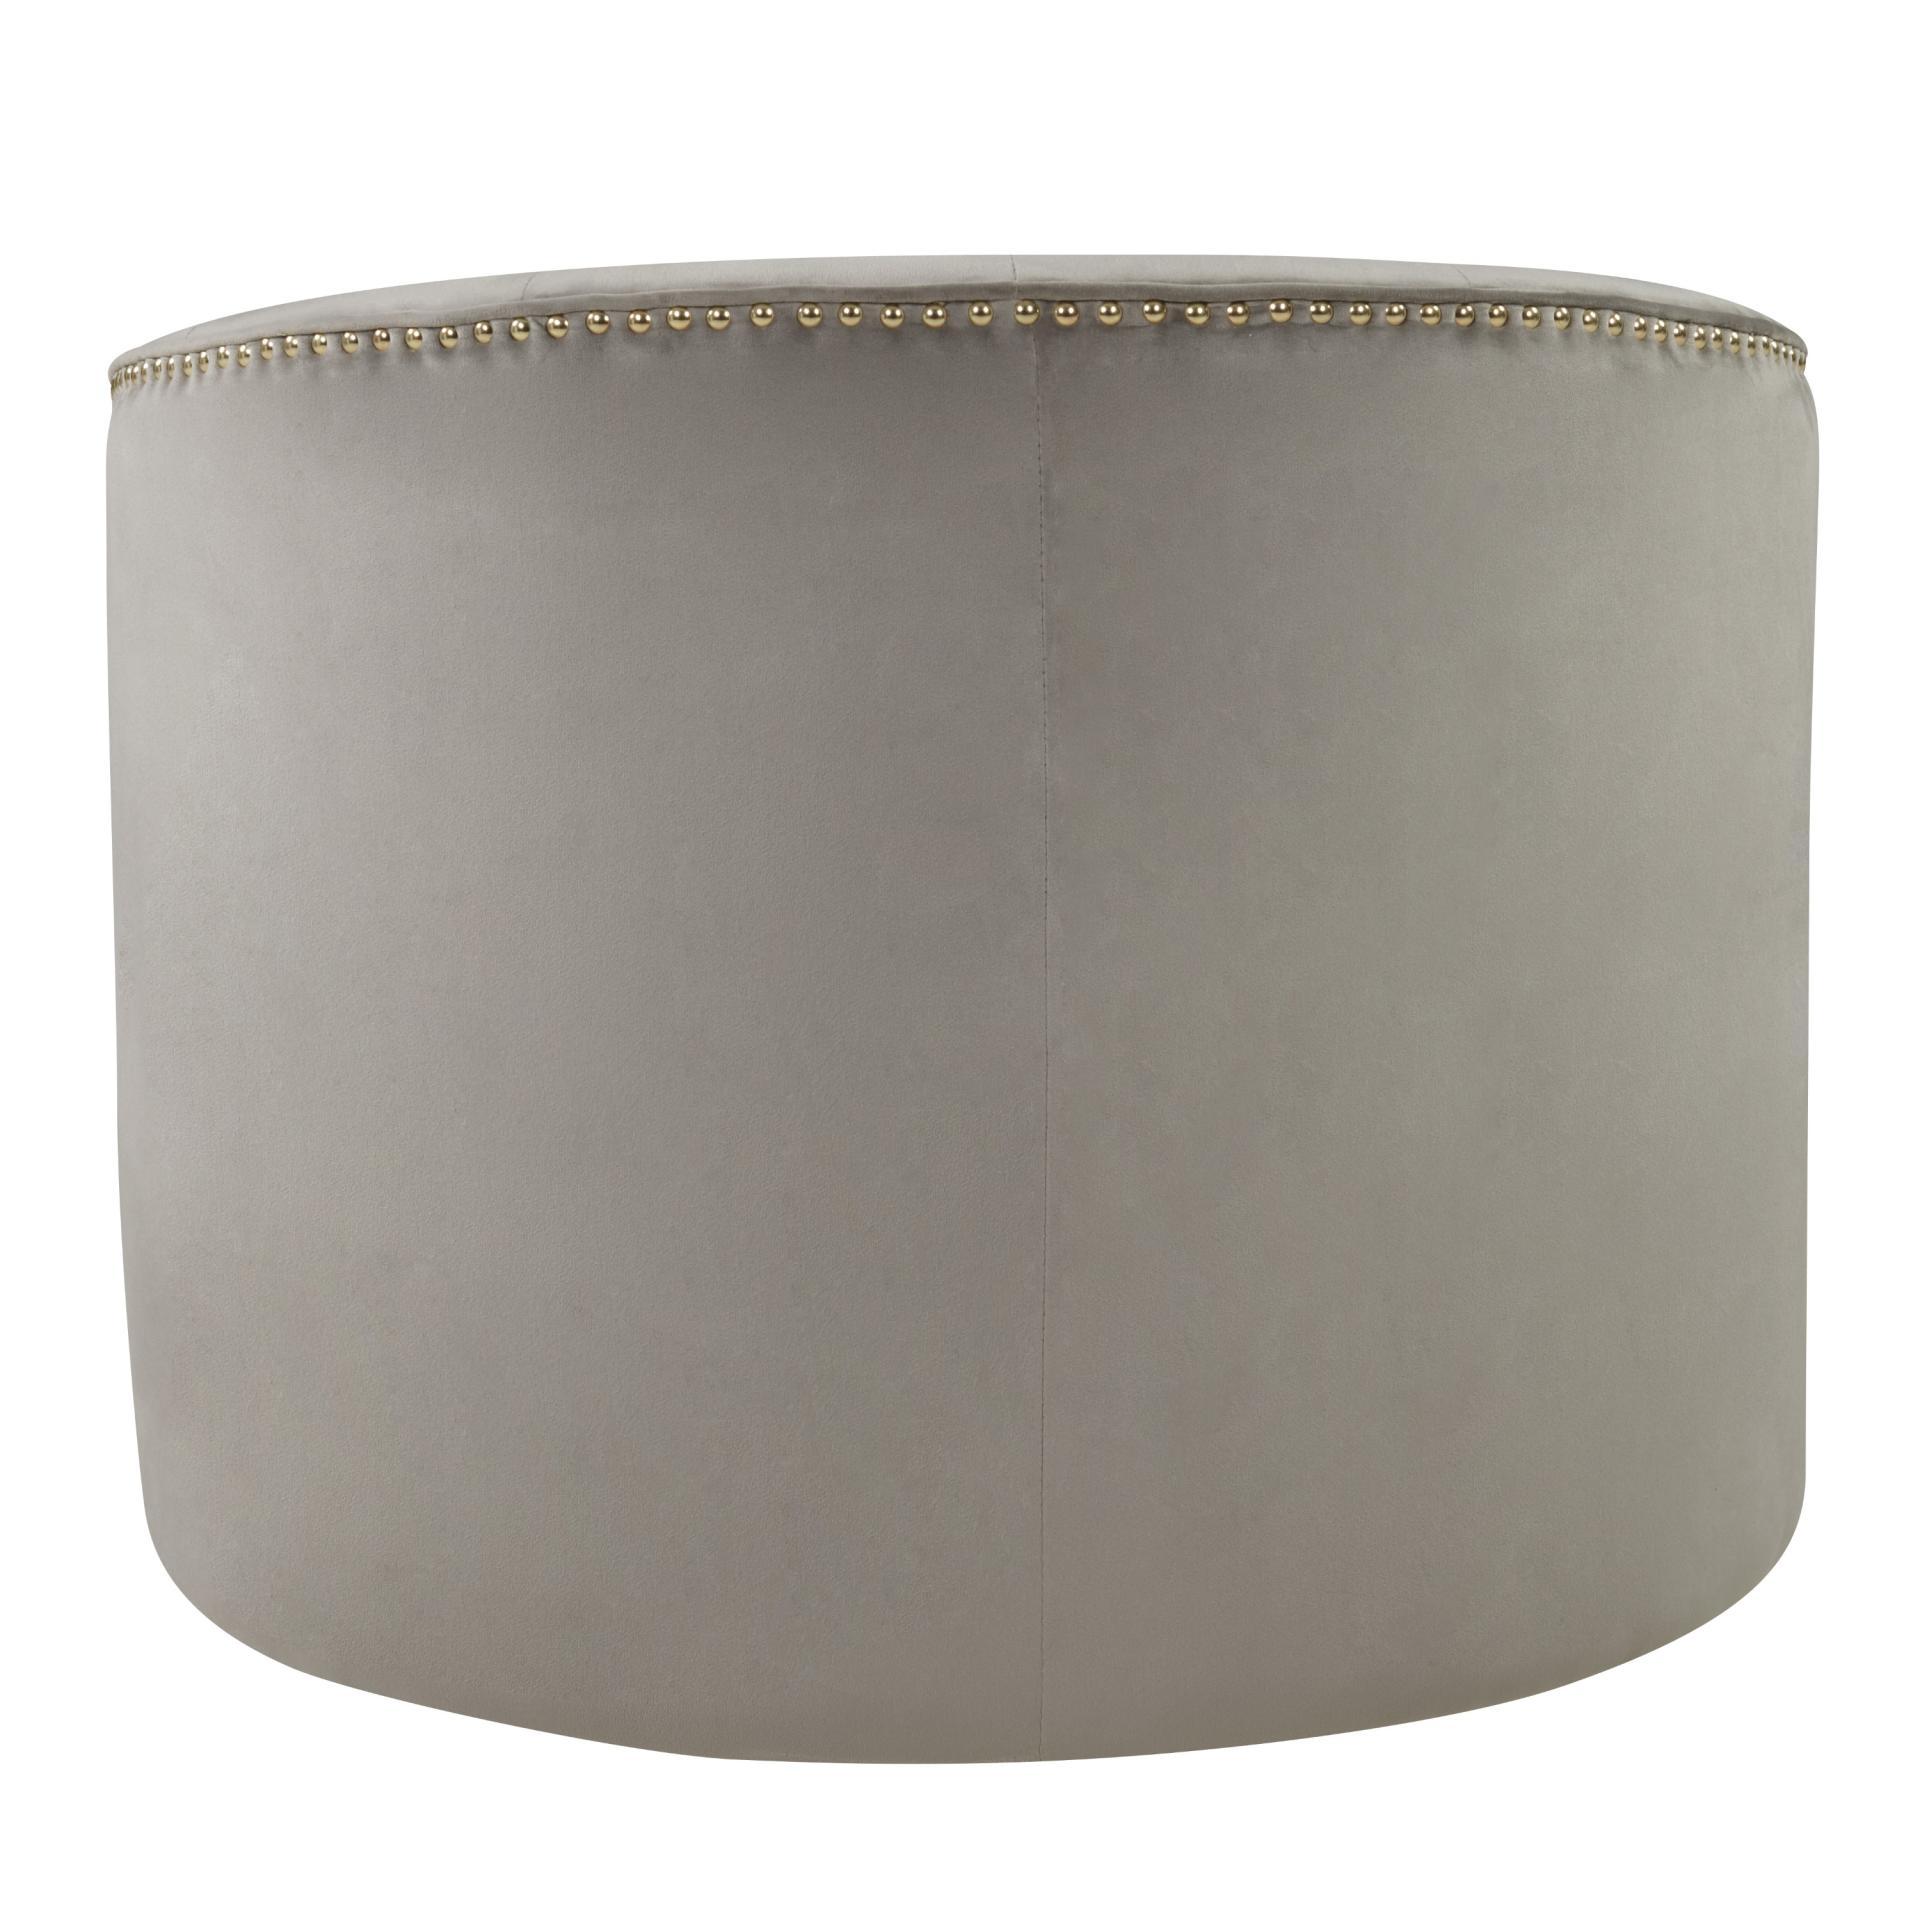 1250003 369 Npd Home Furniture Wholesale Lifestyle